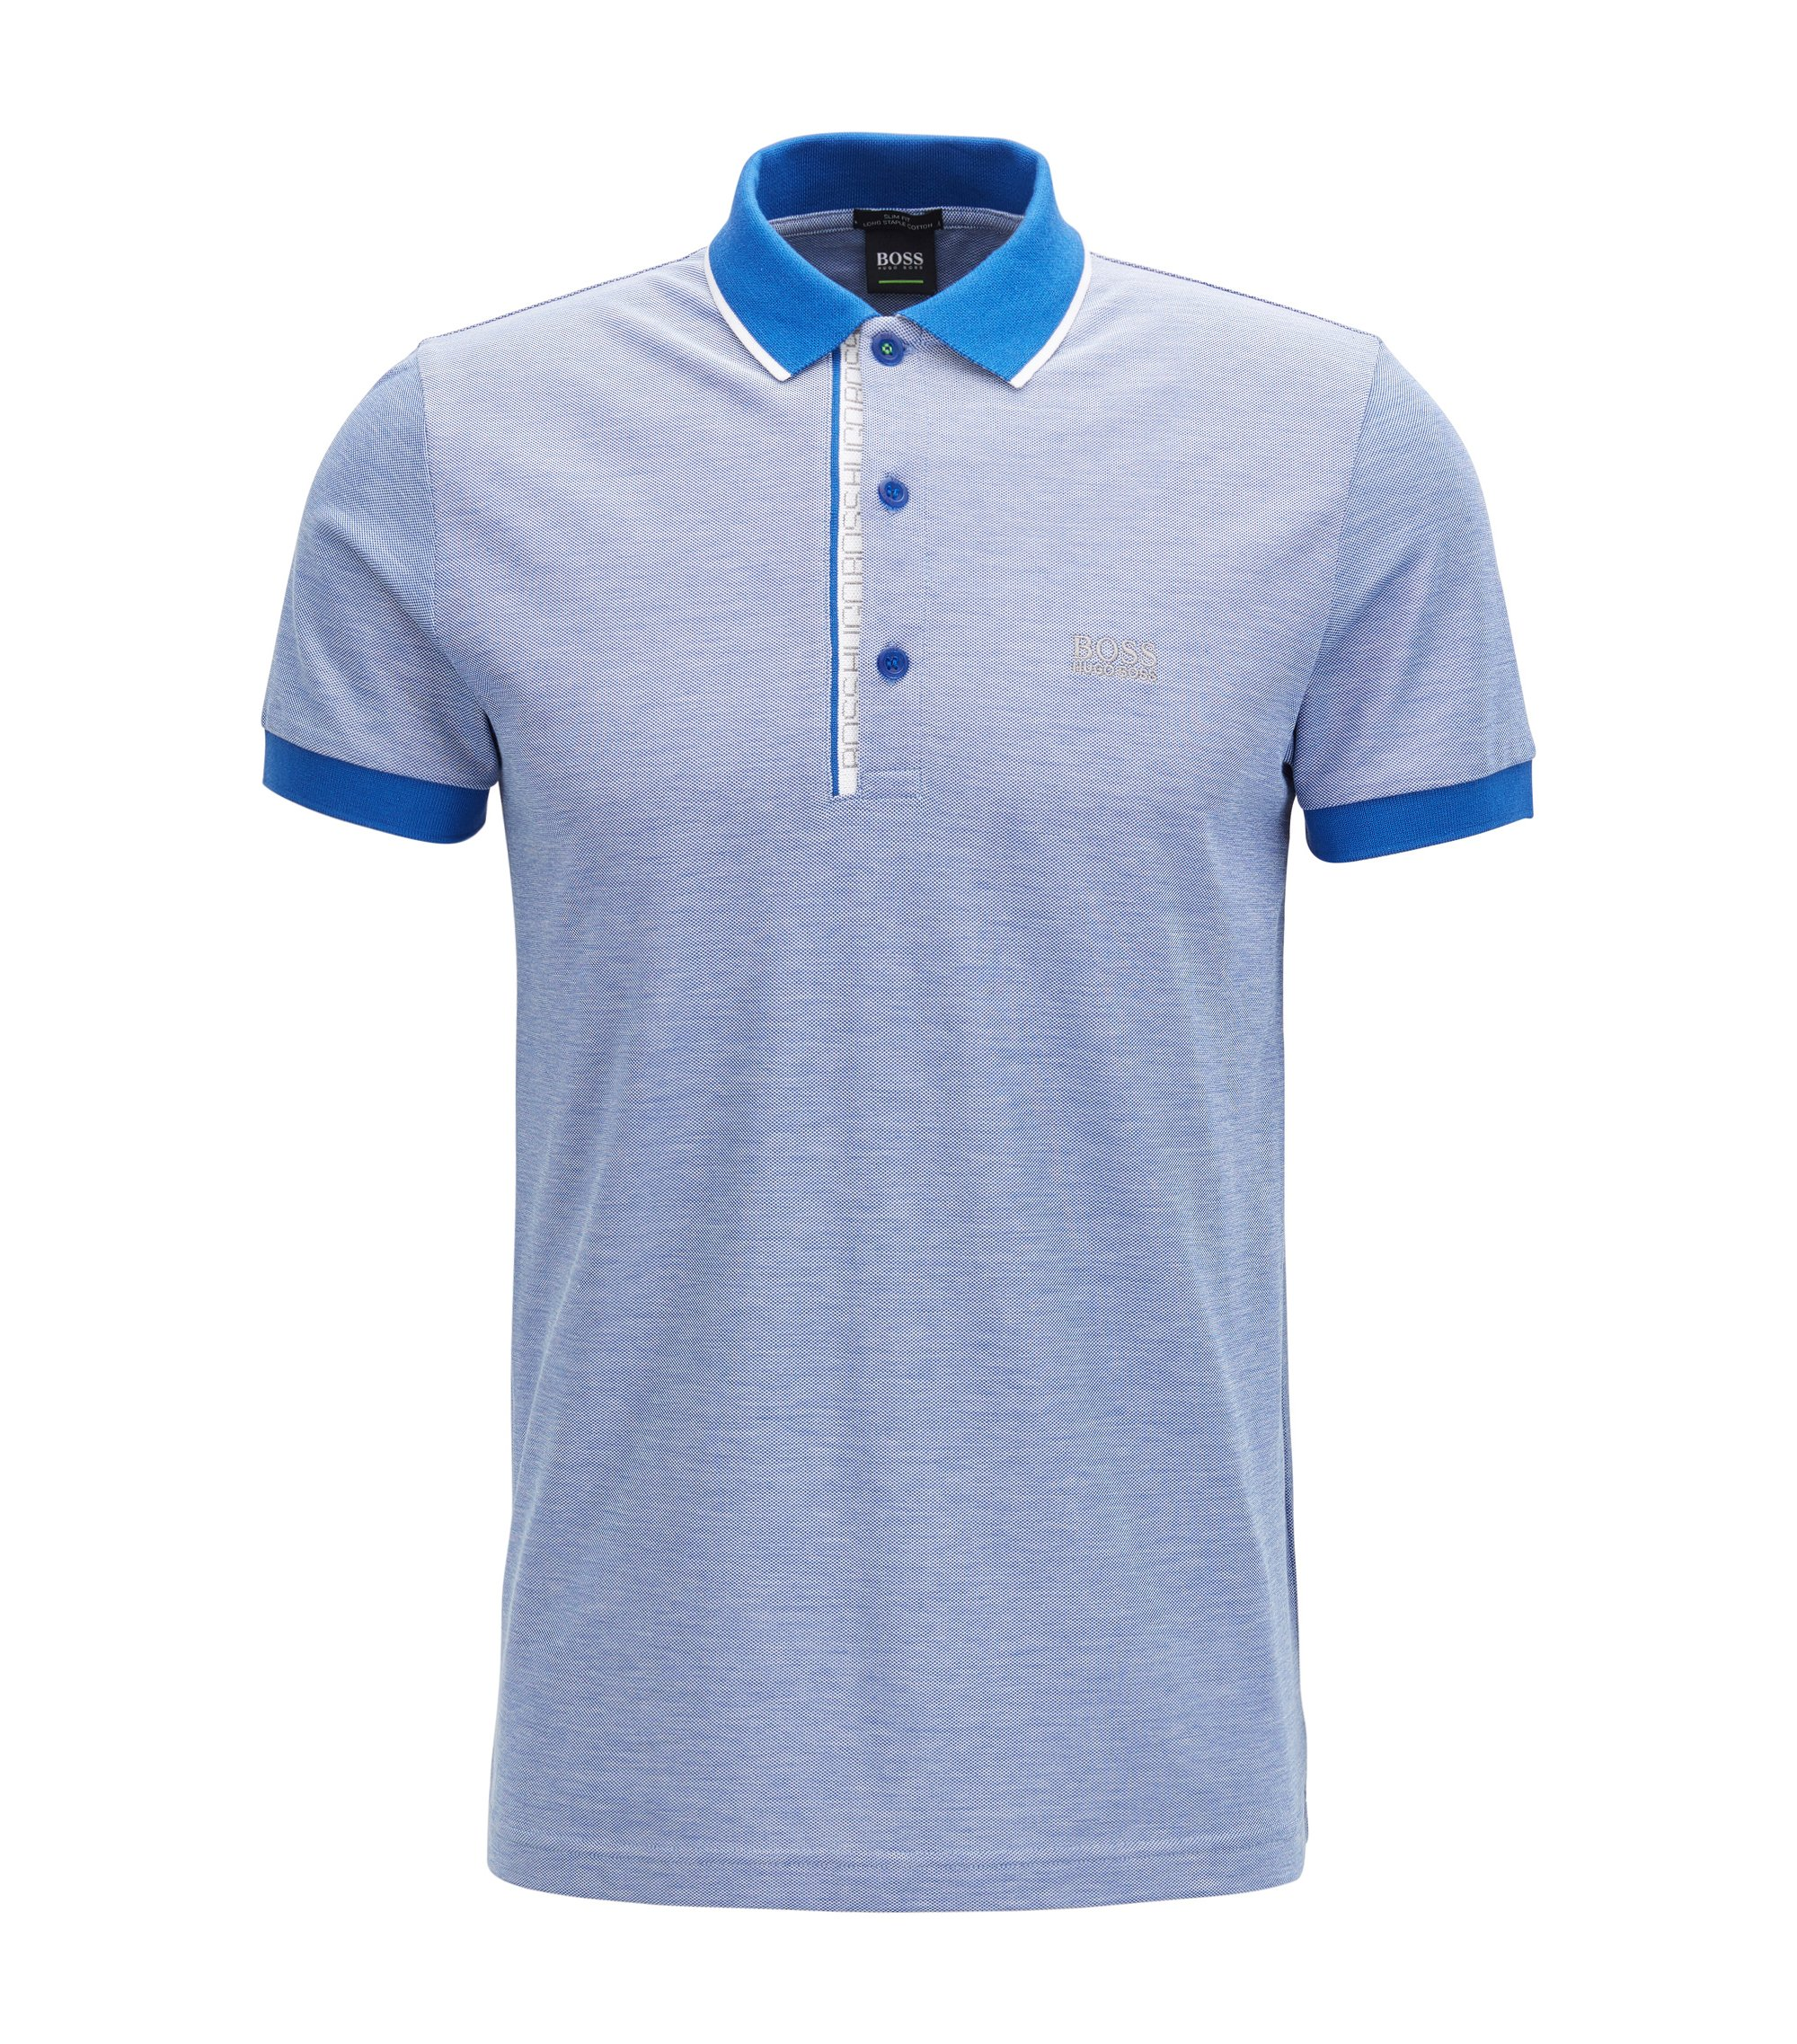 Slim-Fit Poloshirt aus Baumwoll-Piqué mit Logo-Detail, Blau